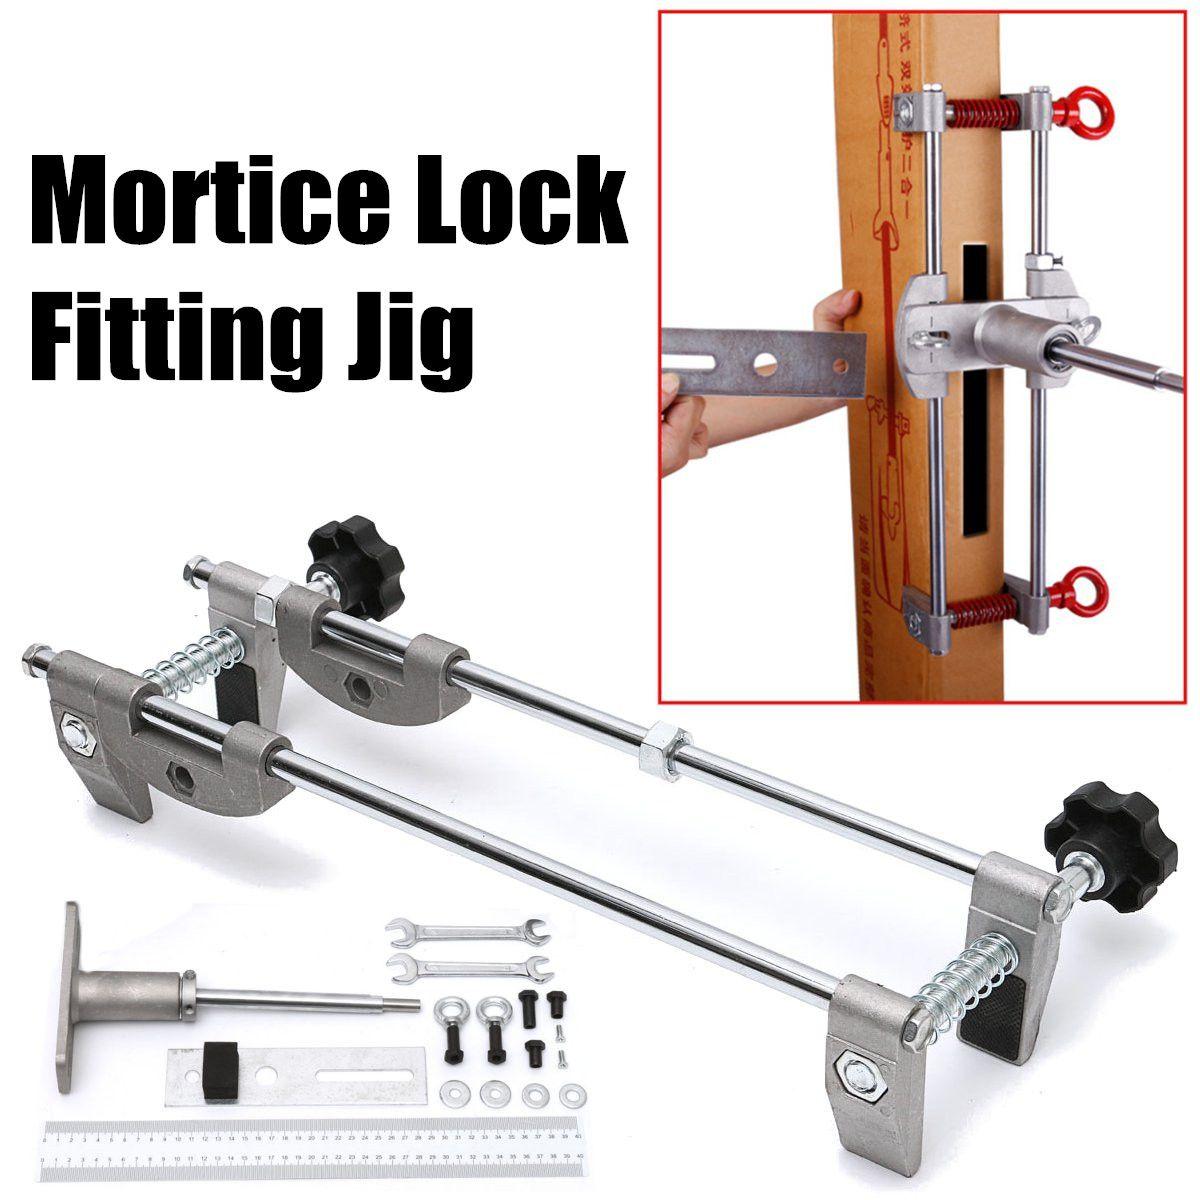 Door Lock Mortiser Fitting Jig Mortice Kit with Wrench Home Improvement Tool Mortice Door Fitting Jig